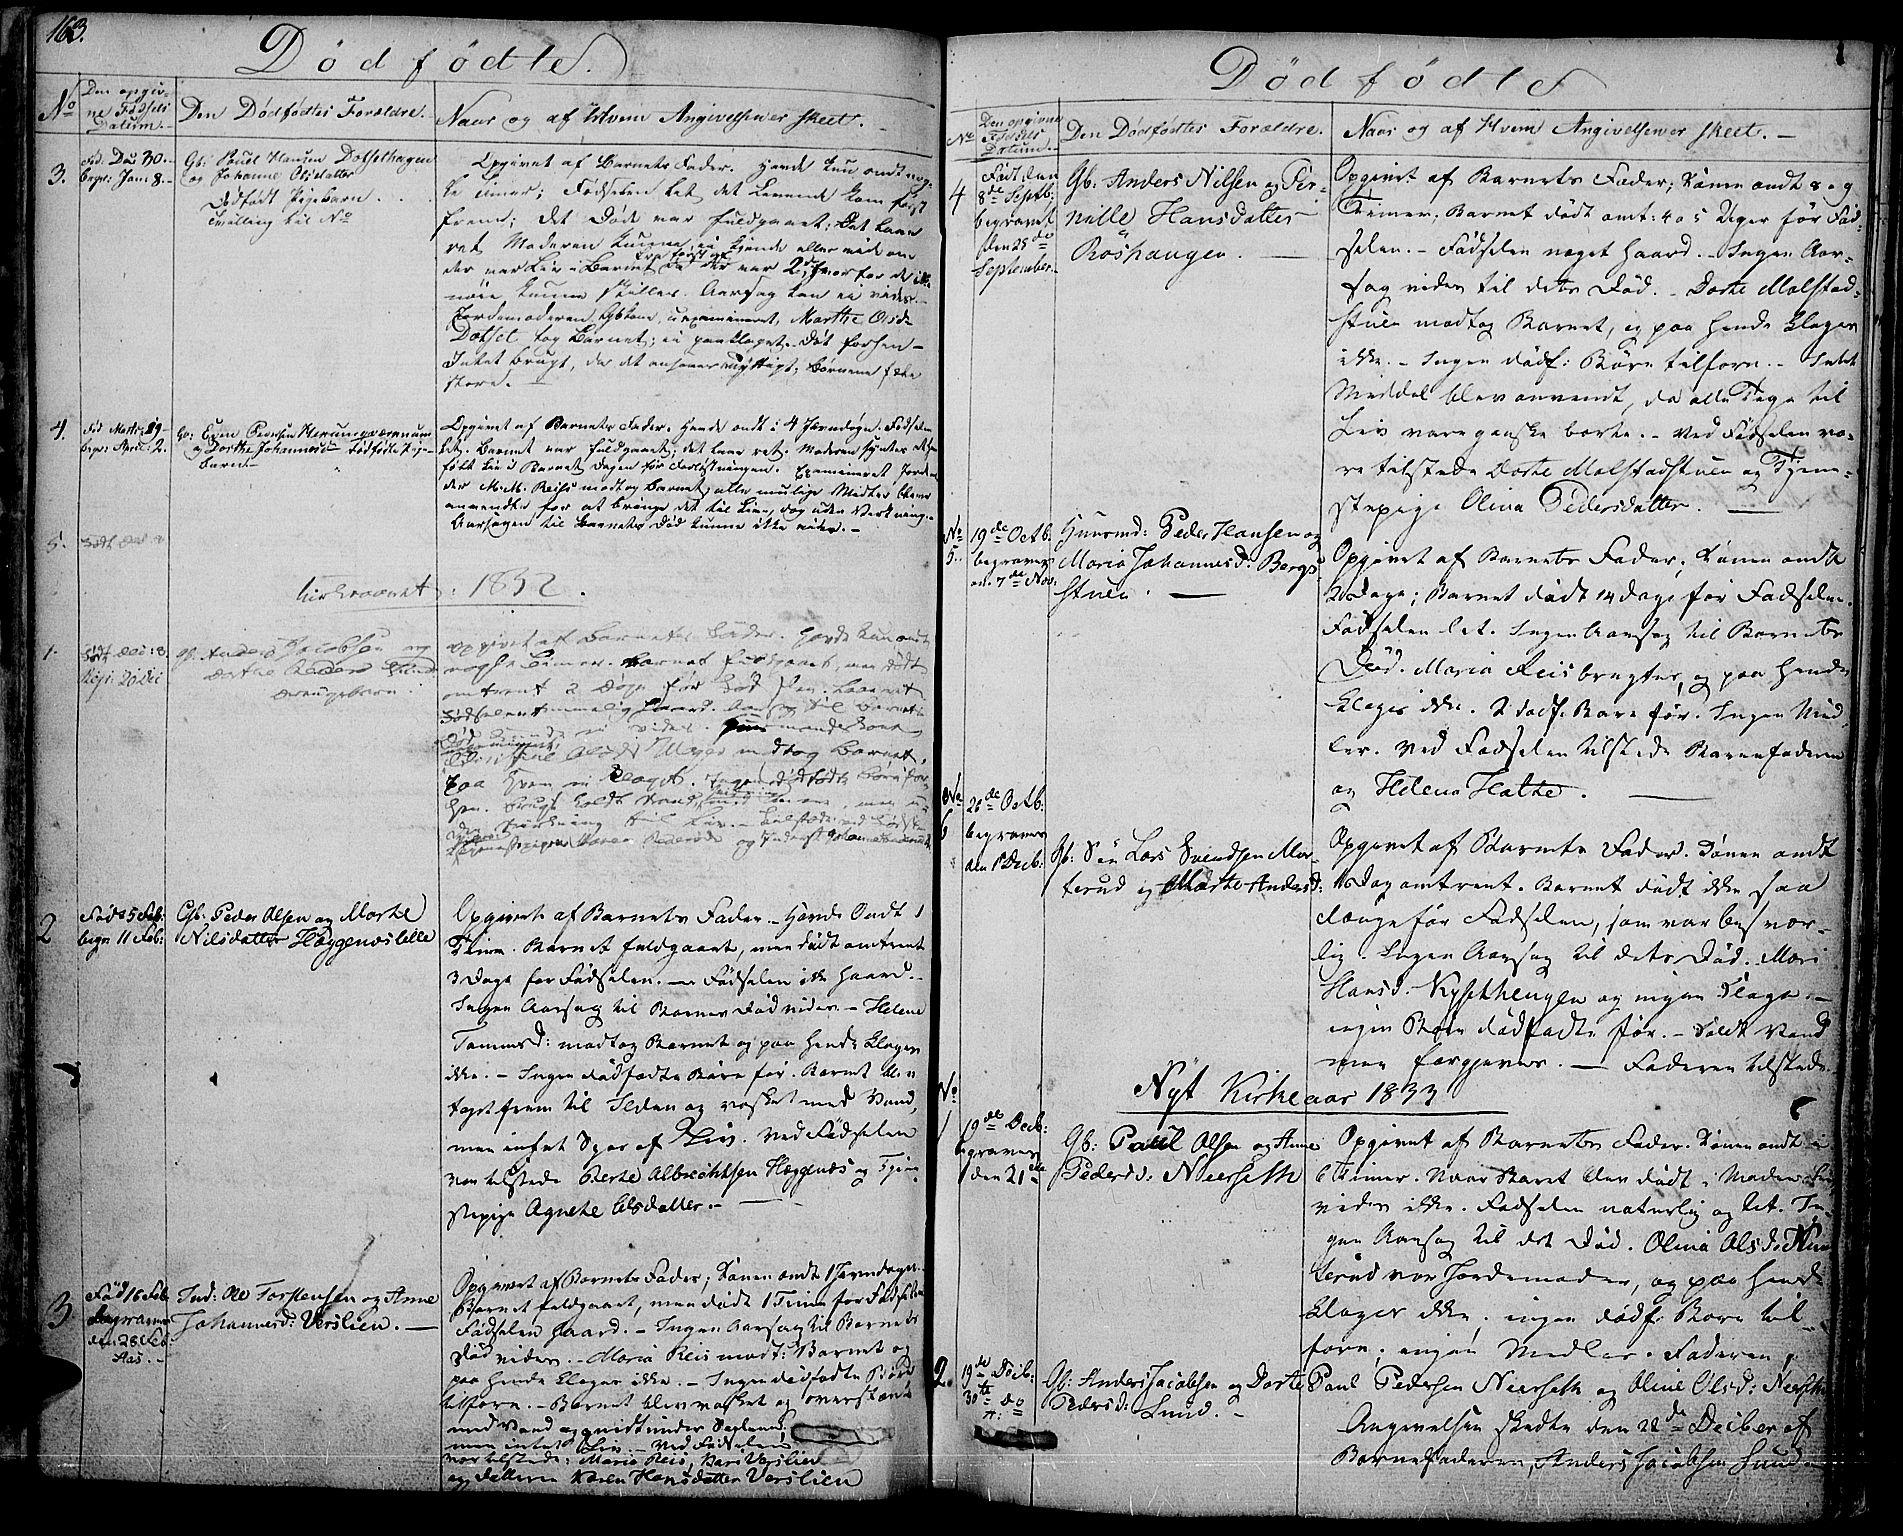 SAH, Vestre Toten prestekontor, H/Ha/Haa/L0002: Ministerialbok nr. 2, 1825-1837, s. 163